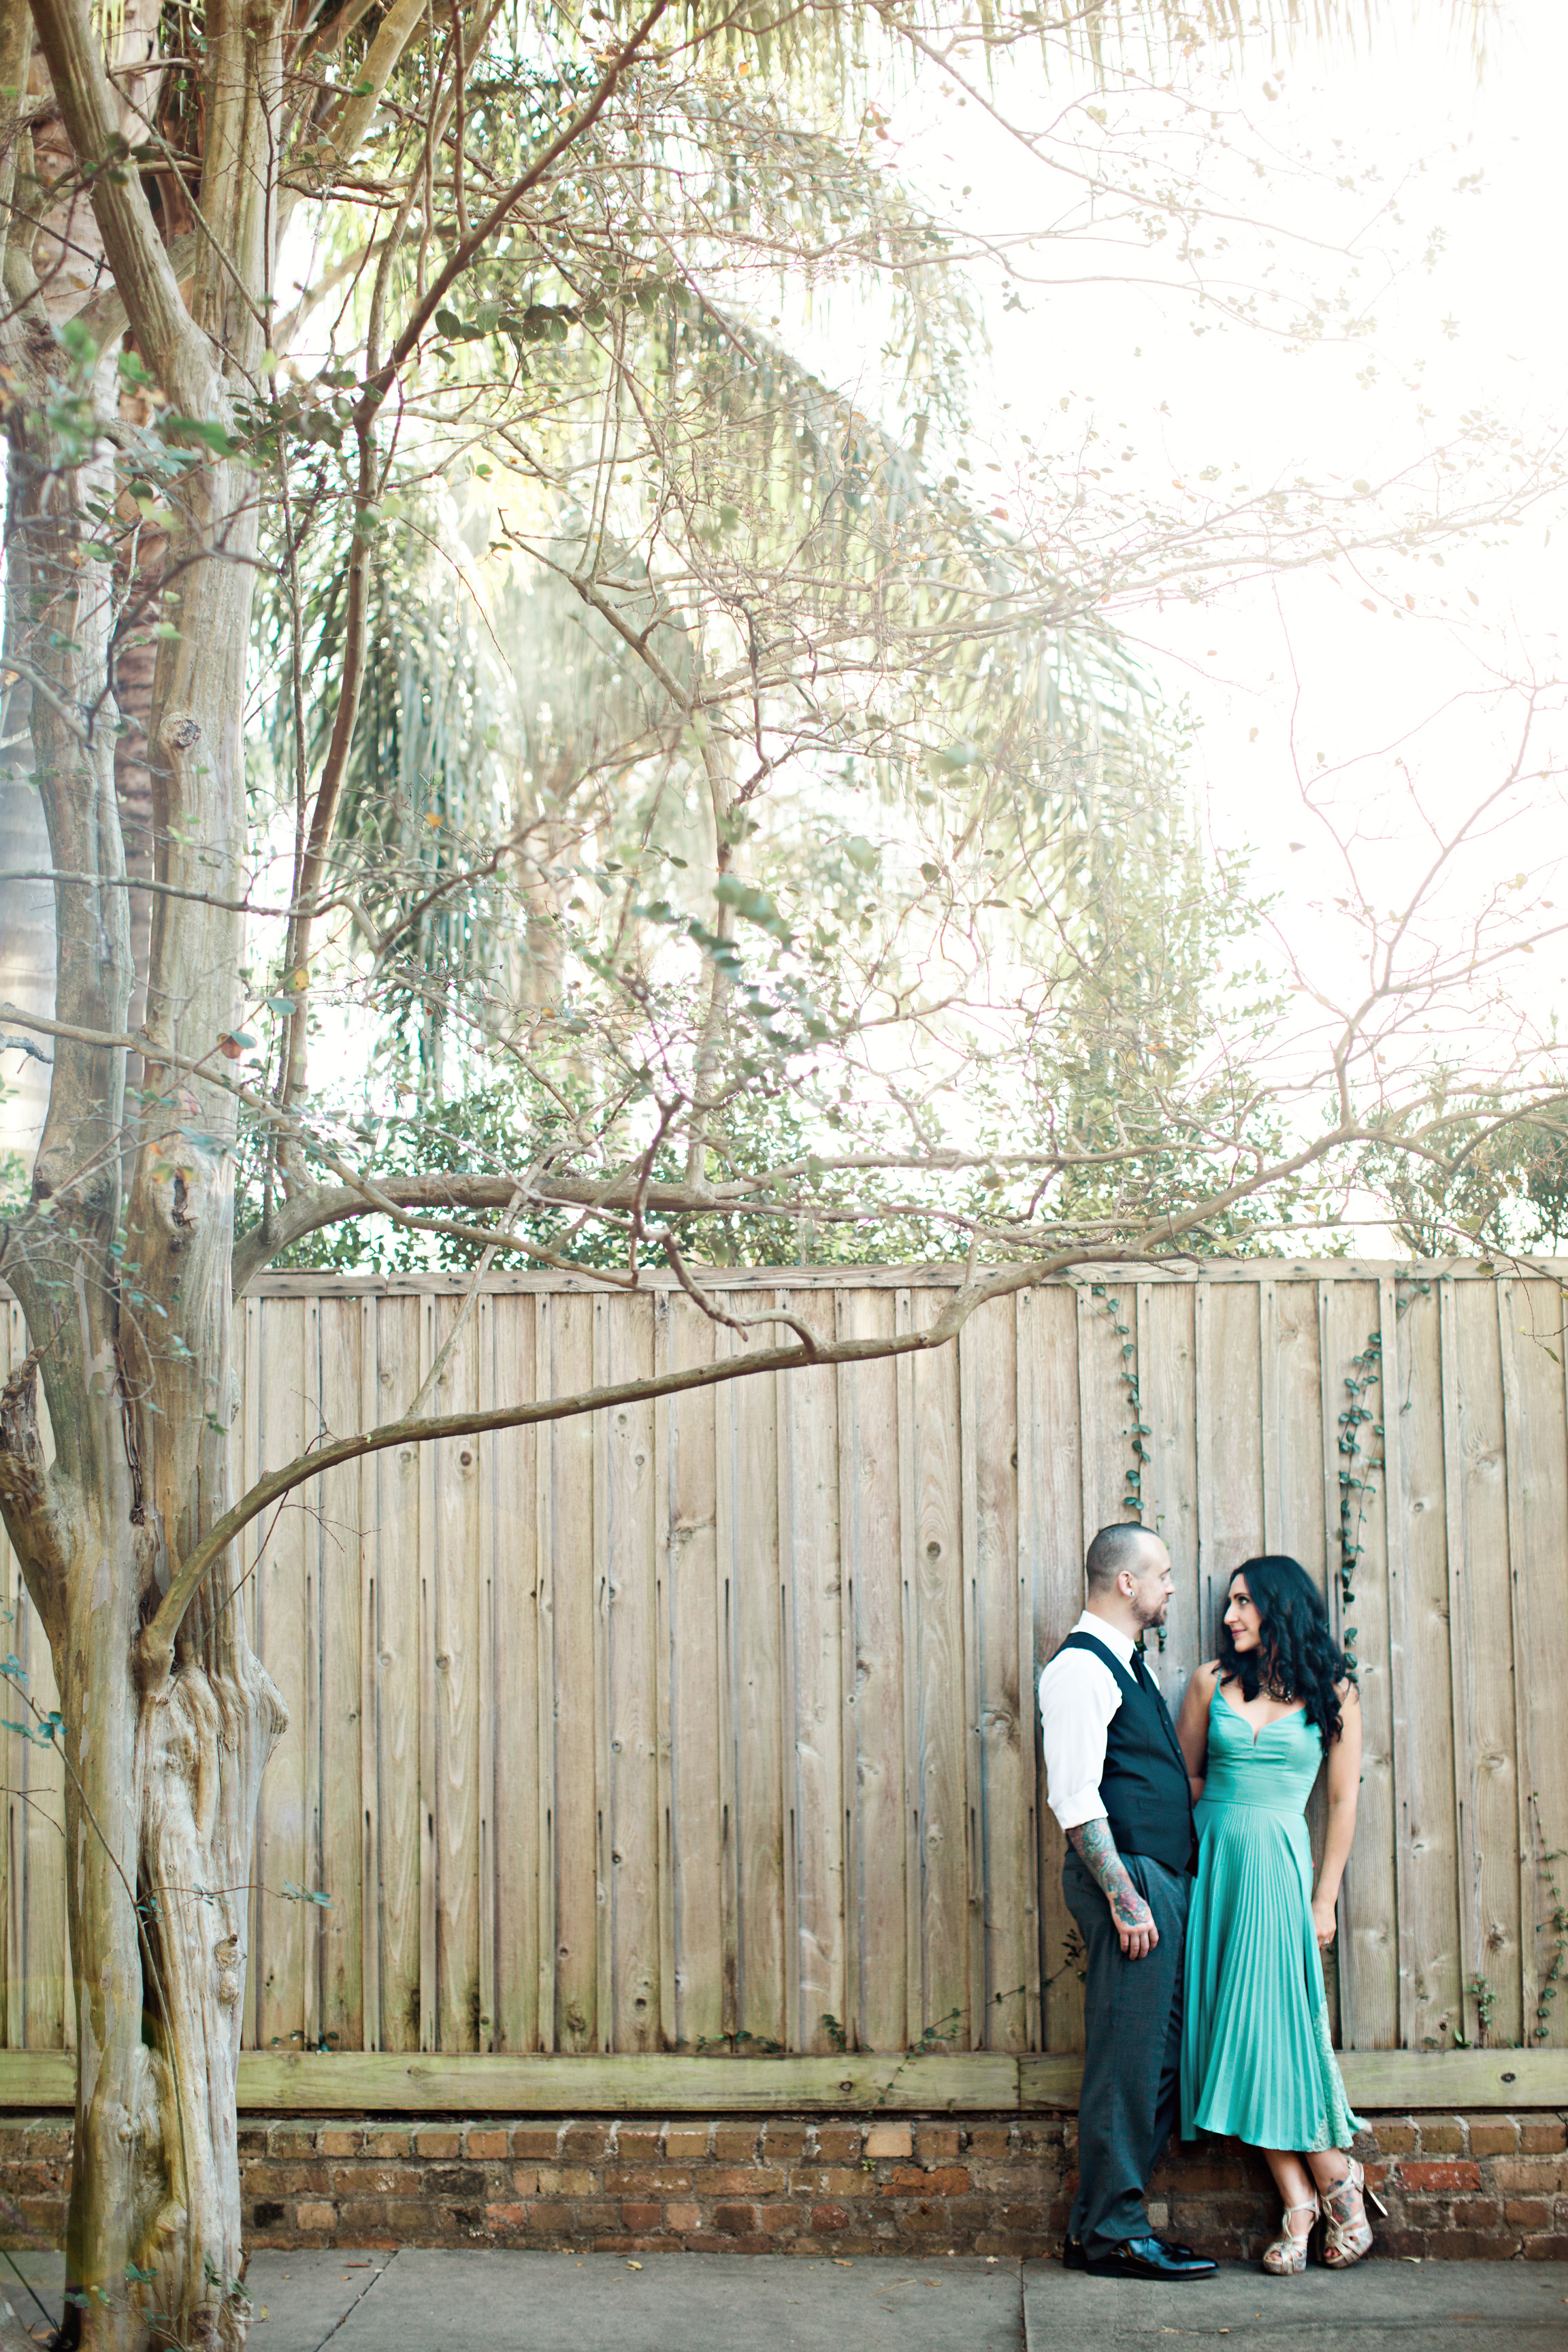 CindyGiovagnoliPhotography_Seattle_Washington_PNW_Couple_Engagement_Portrait_Photography-002.jpg